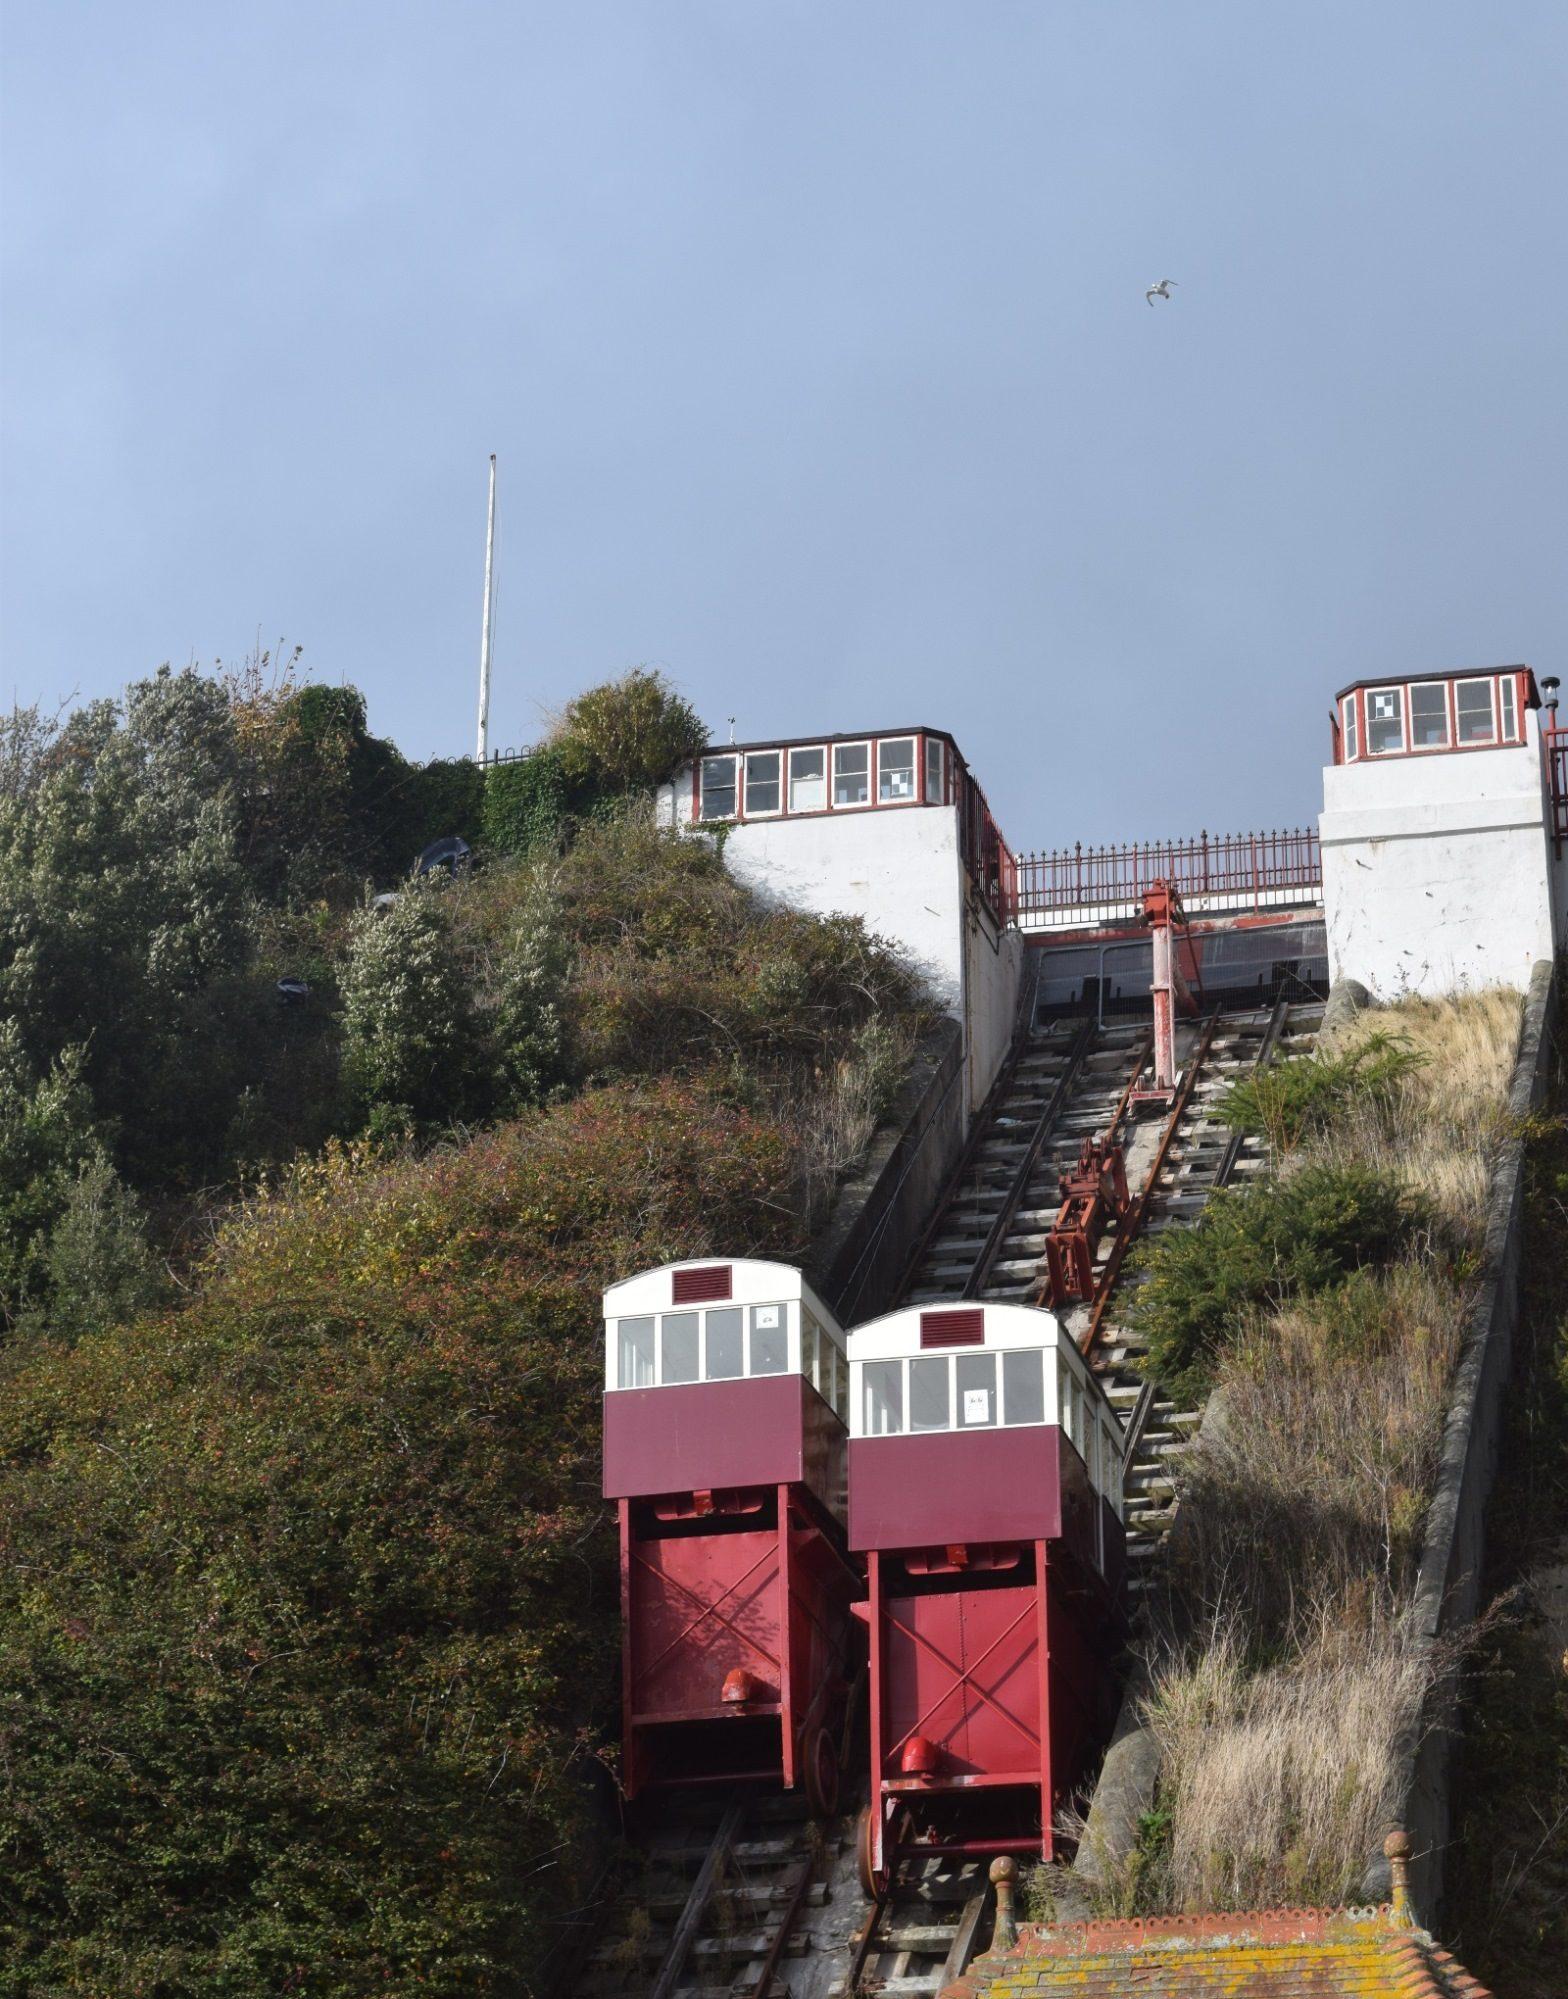 The Leas Lift in Folkestone